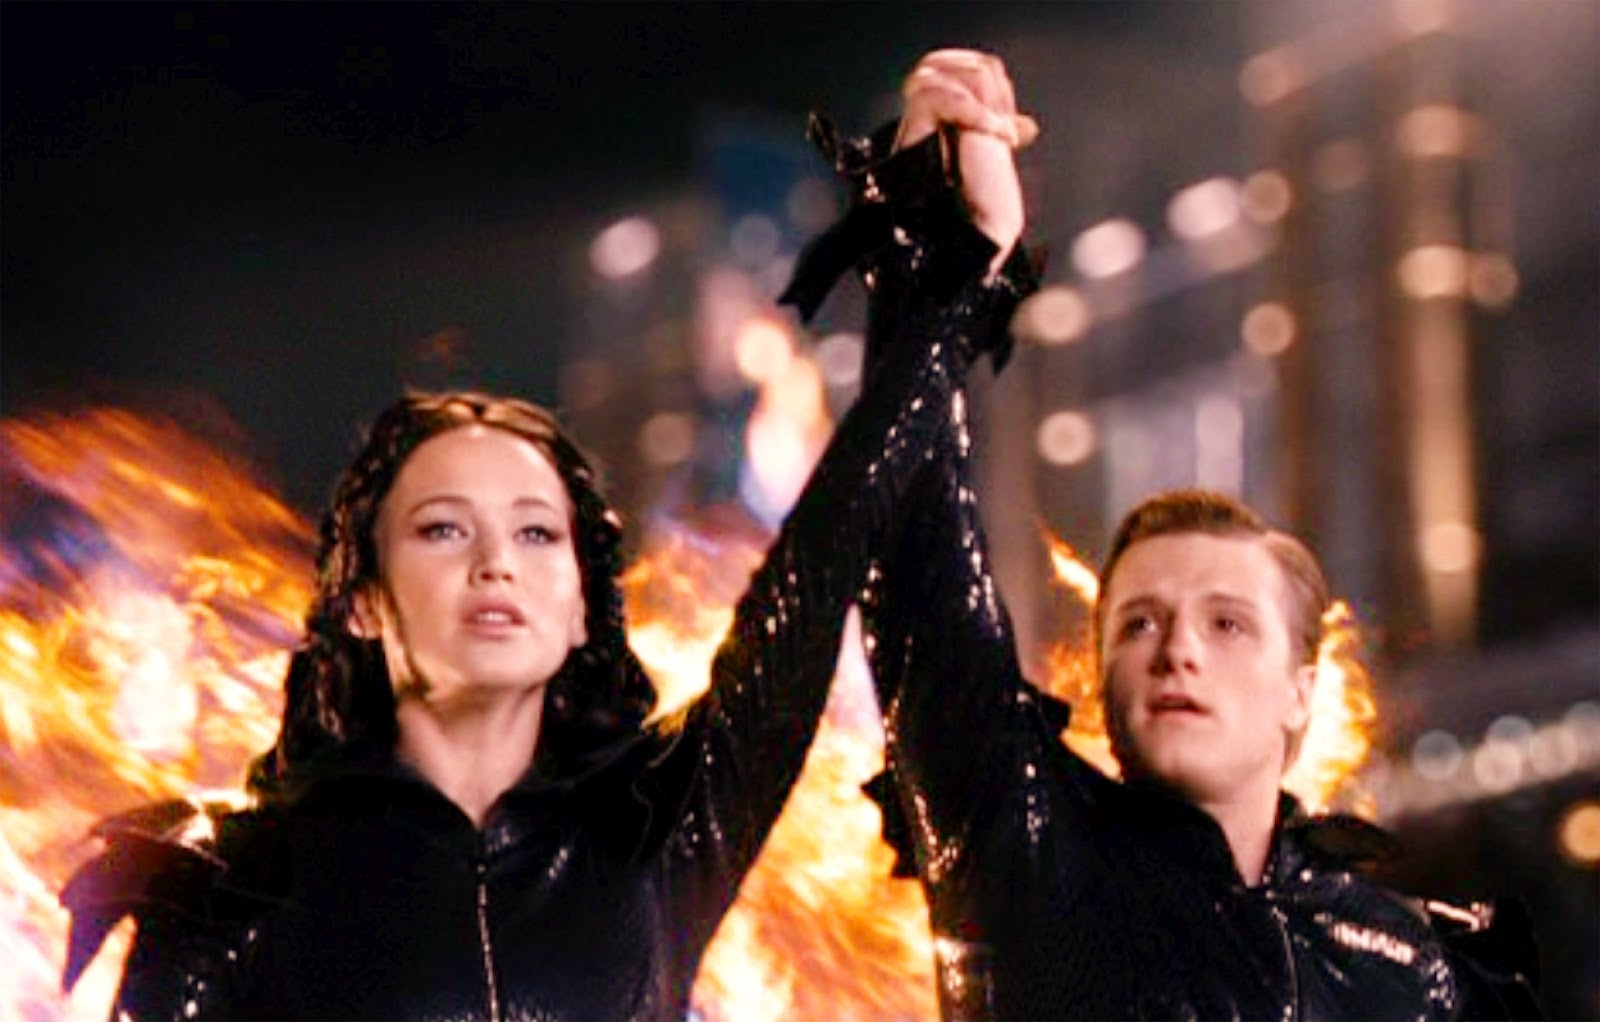 Peeta Mellark and Katniss Everdeen - Peeta Mellark and